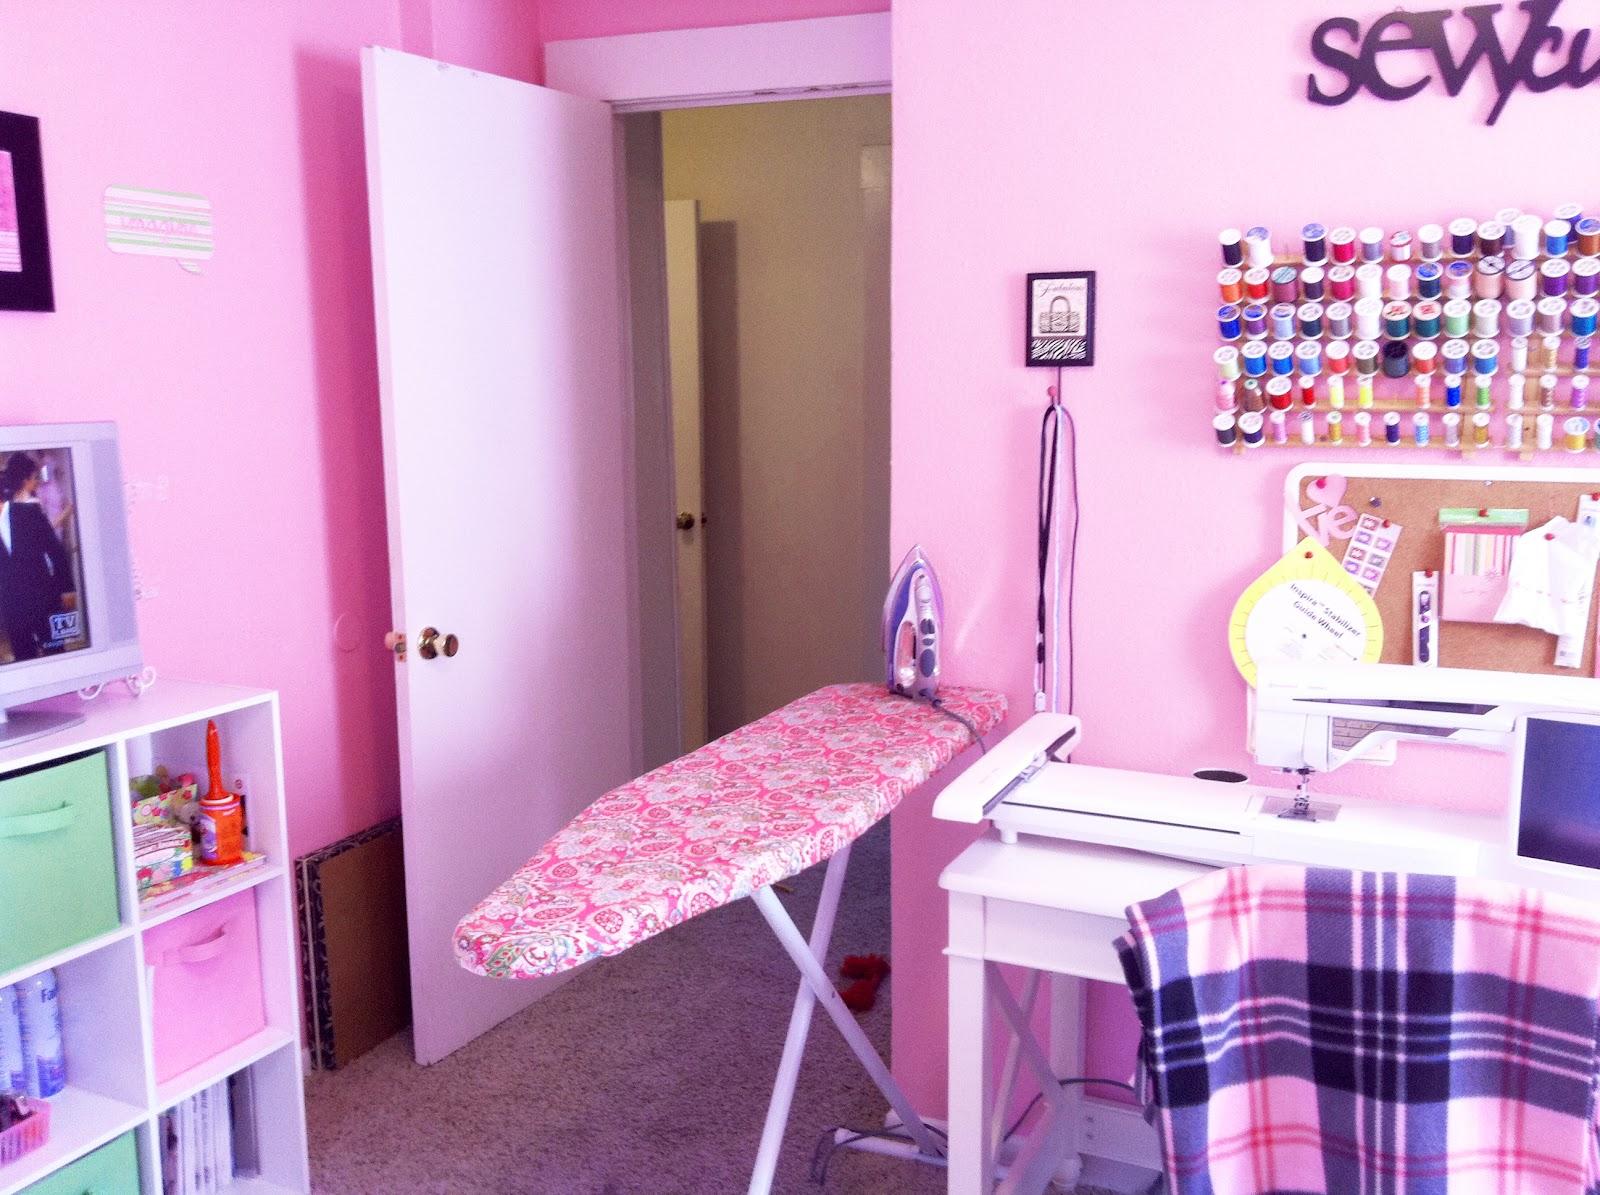 http://4.bp.blogspot.com/-VysT4HM966I/UCkodhMP9CI/AAAAAAAAAoY/BJPbxKcJXiM/s1600/Sewing+Room+3.jpg